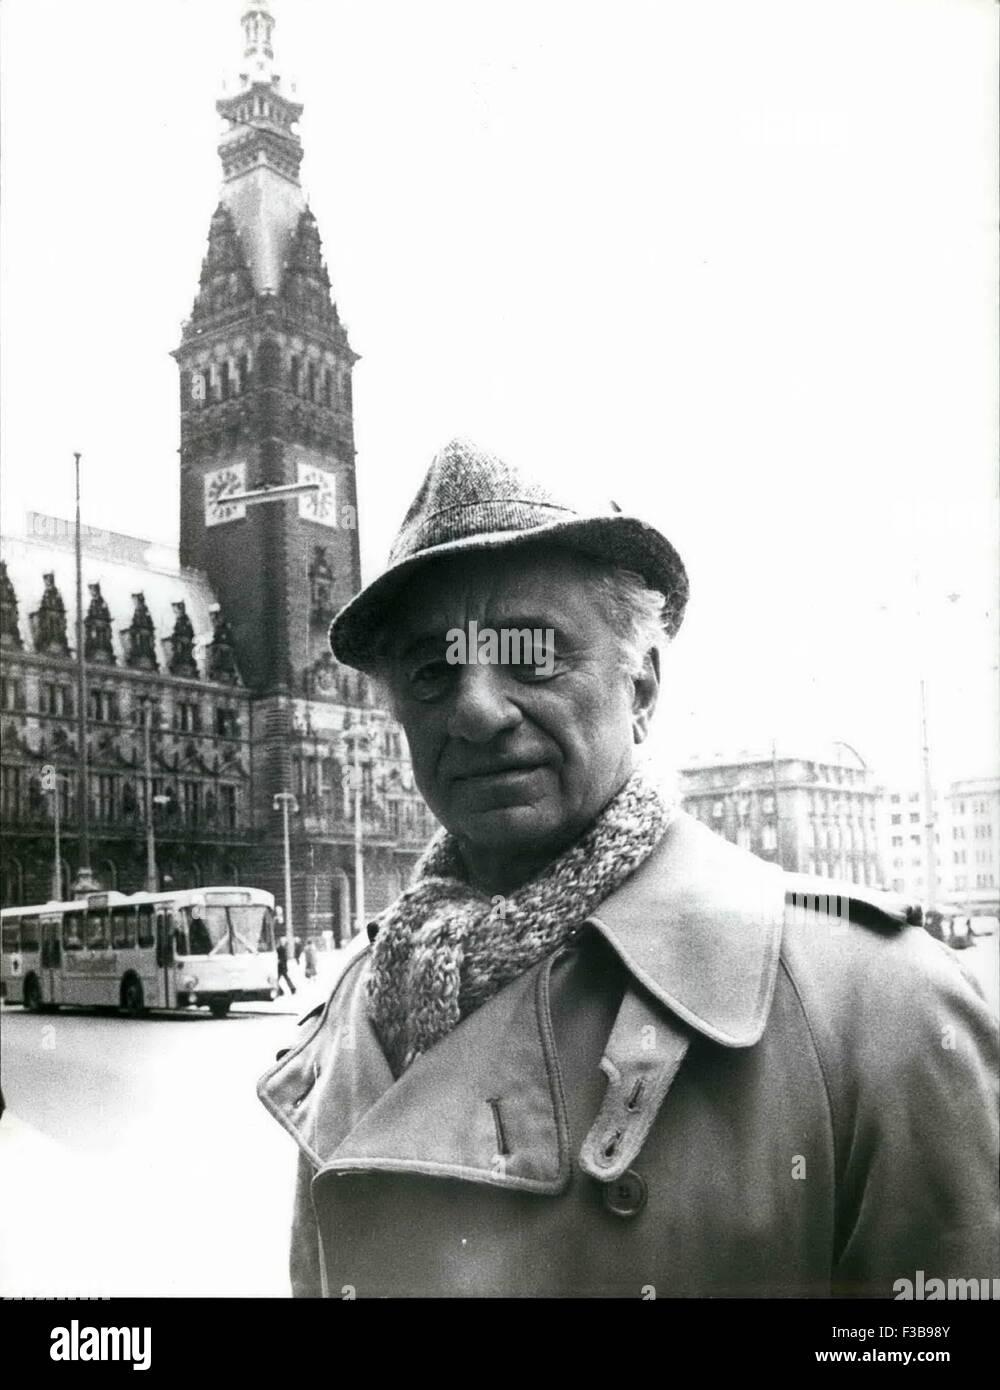 March 11, 1977 - Elia Kazan in West Germany: he Last Typoon is the last i.e. the latest film directed bu Elia Kazan - Stock Image